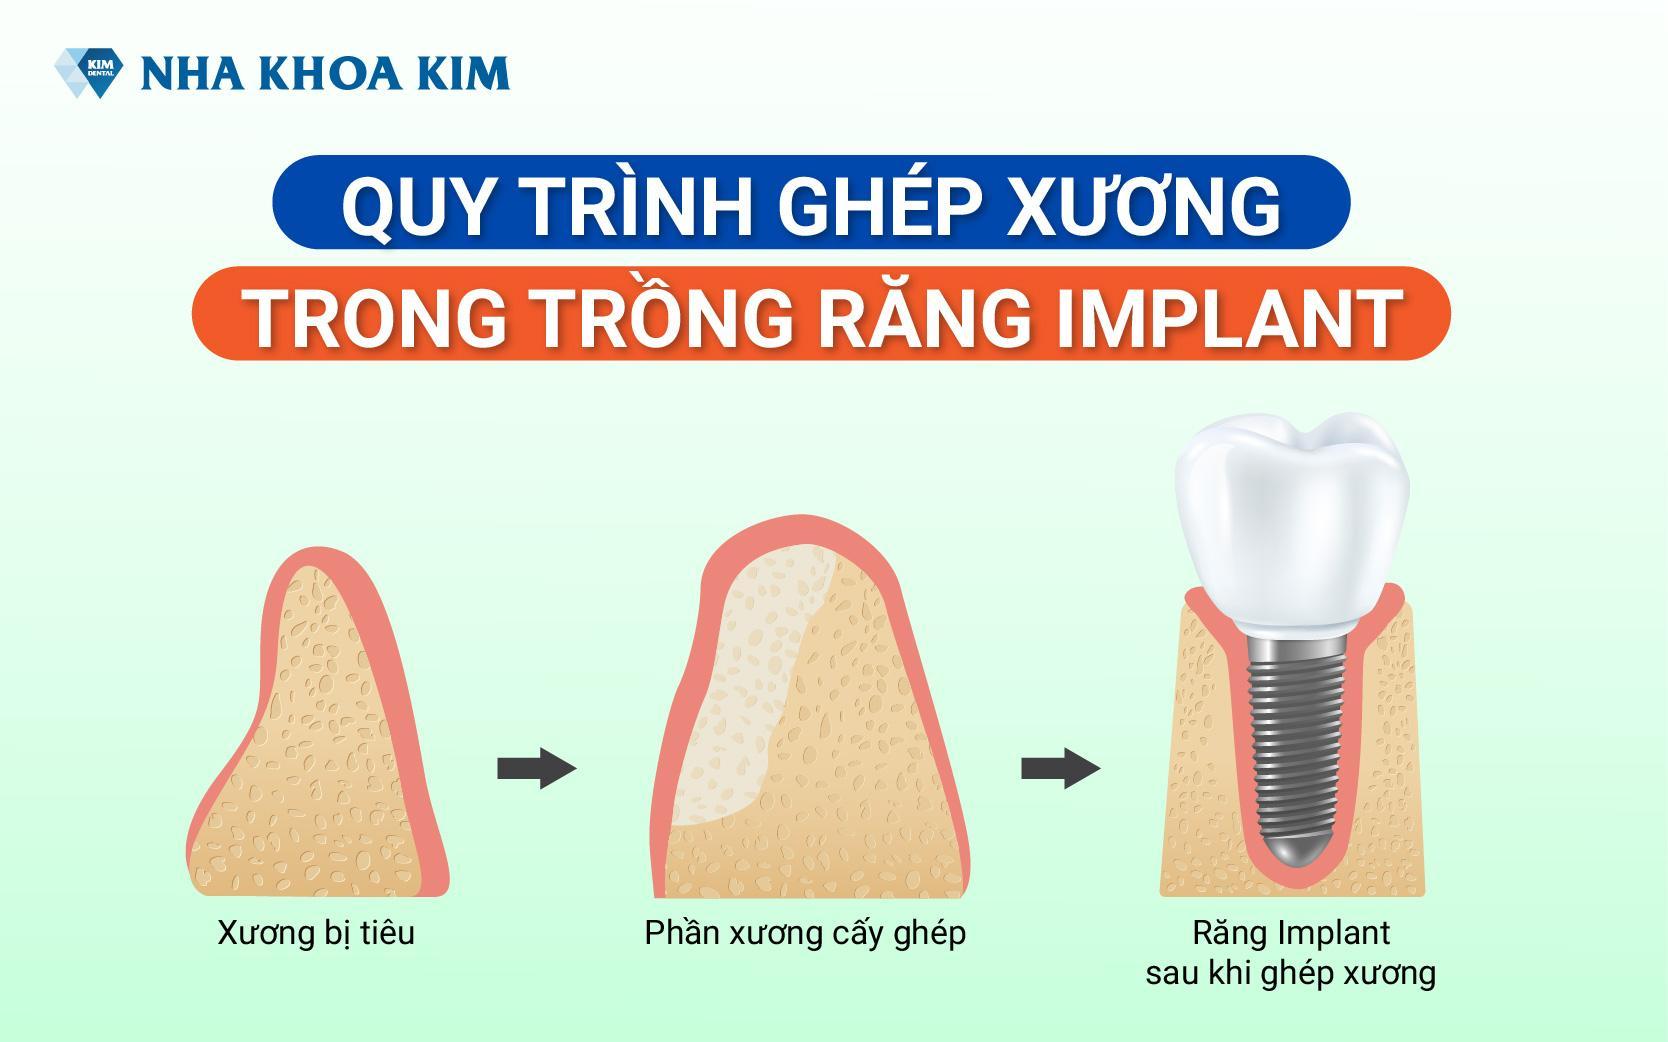 quy-trinh-ghep-xuong-implant